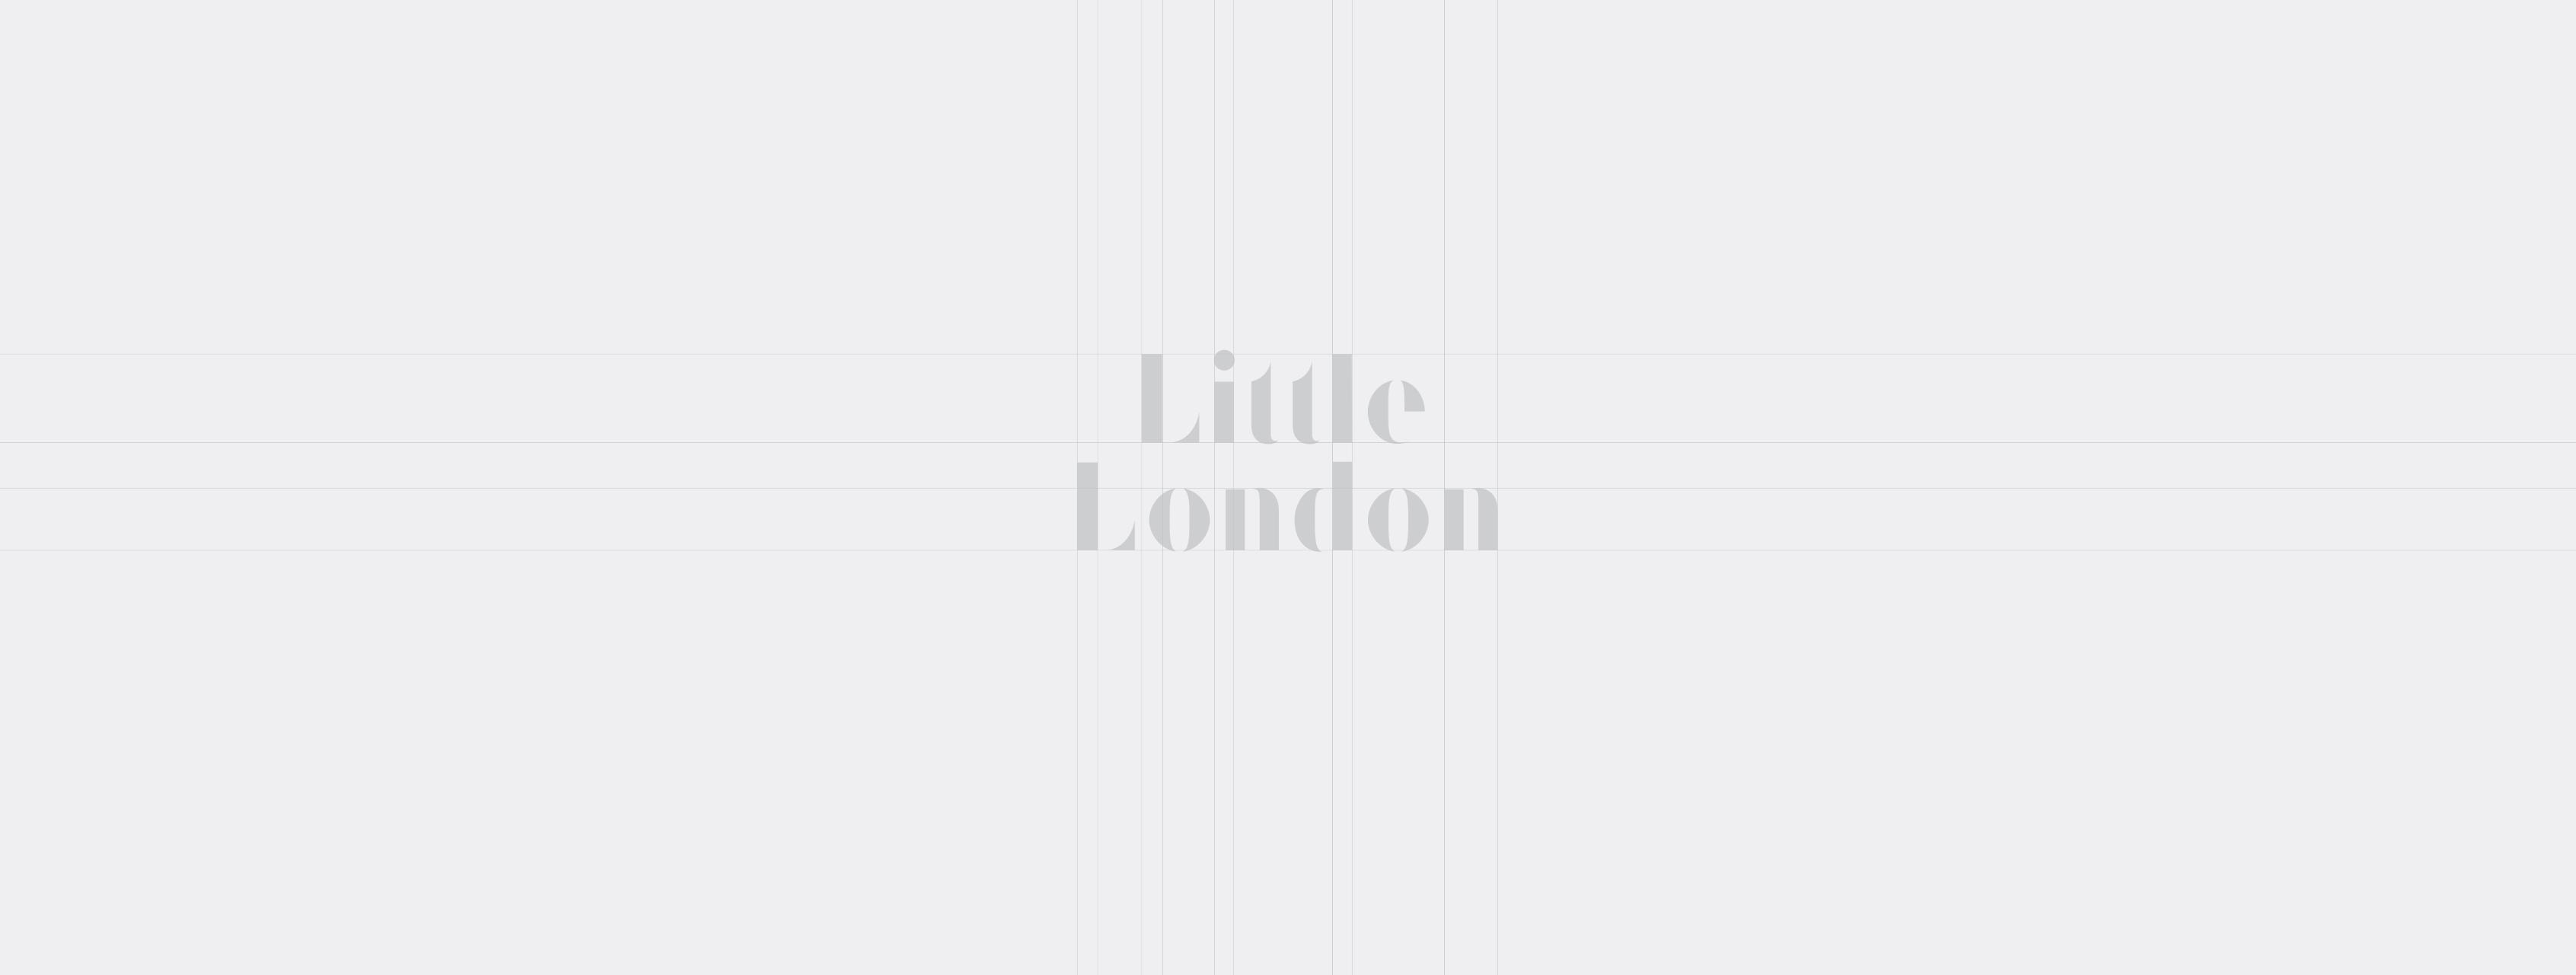 somewhere-little-london-logo